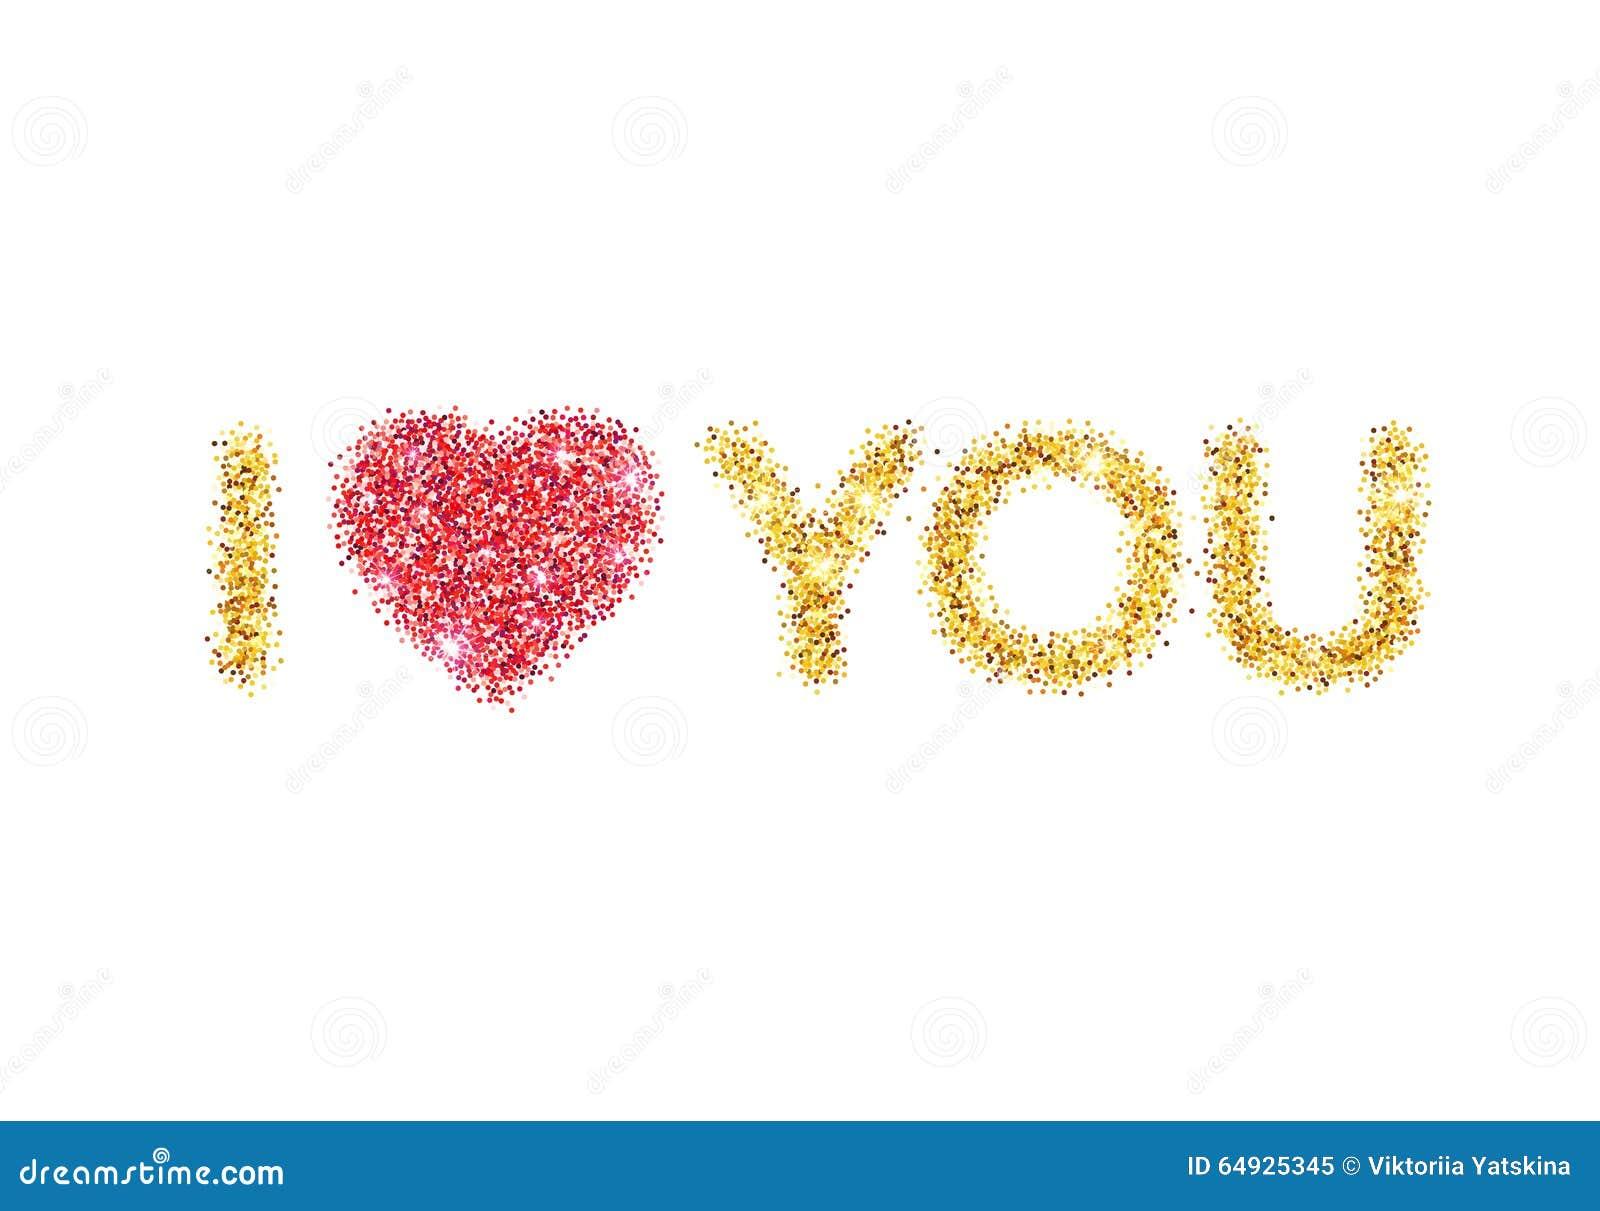 i love you heart glitter - photo #30